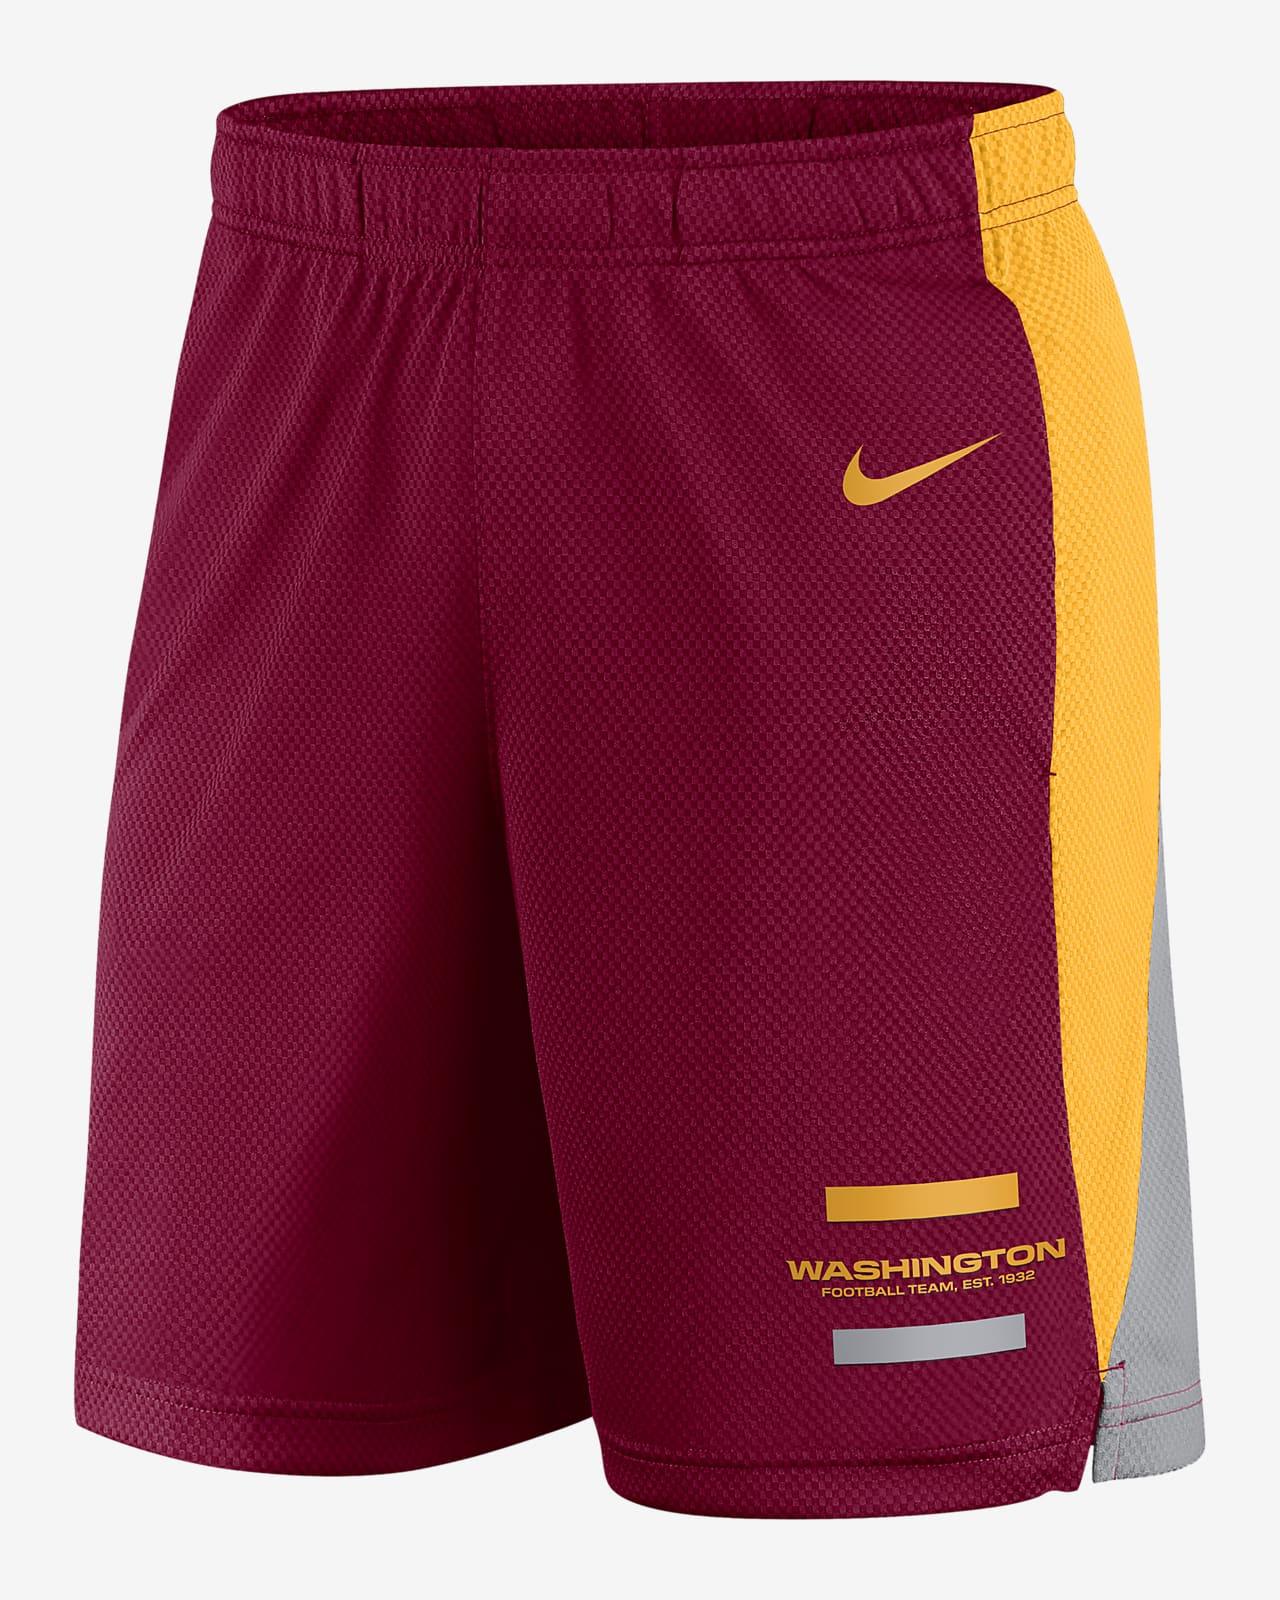 Nike Dri-FIT Broadcast (NFL Washington Football Team) Men's Shorts